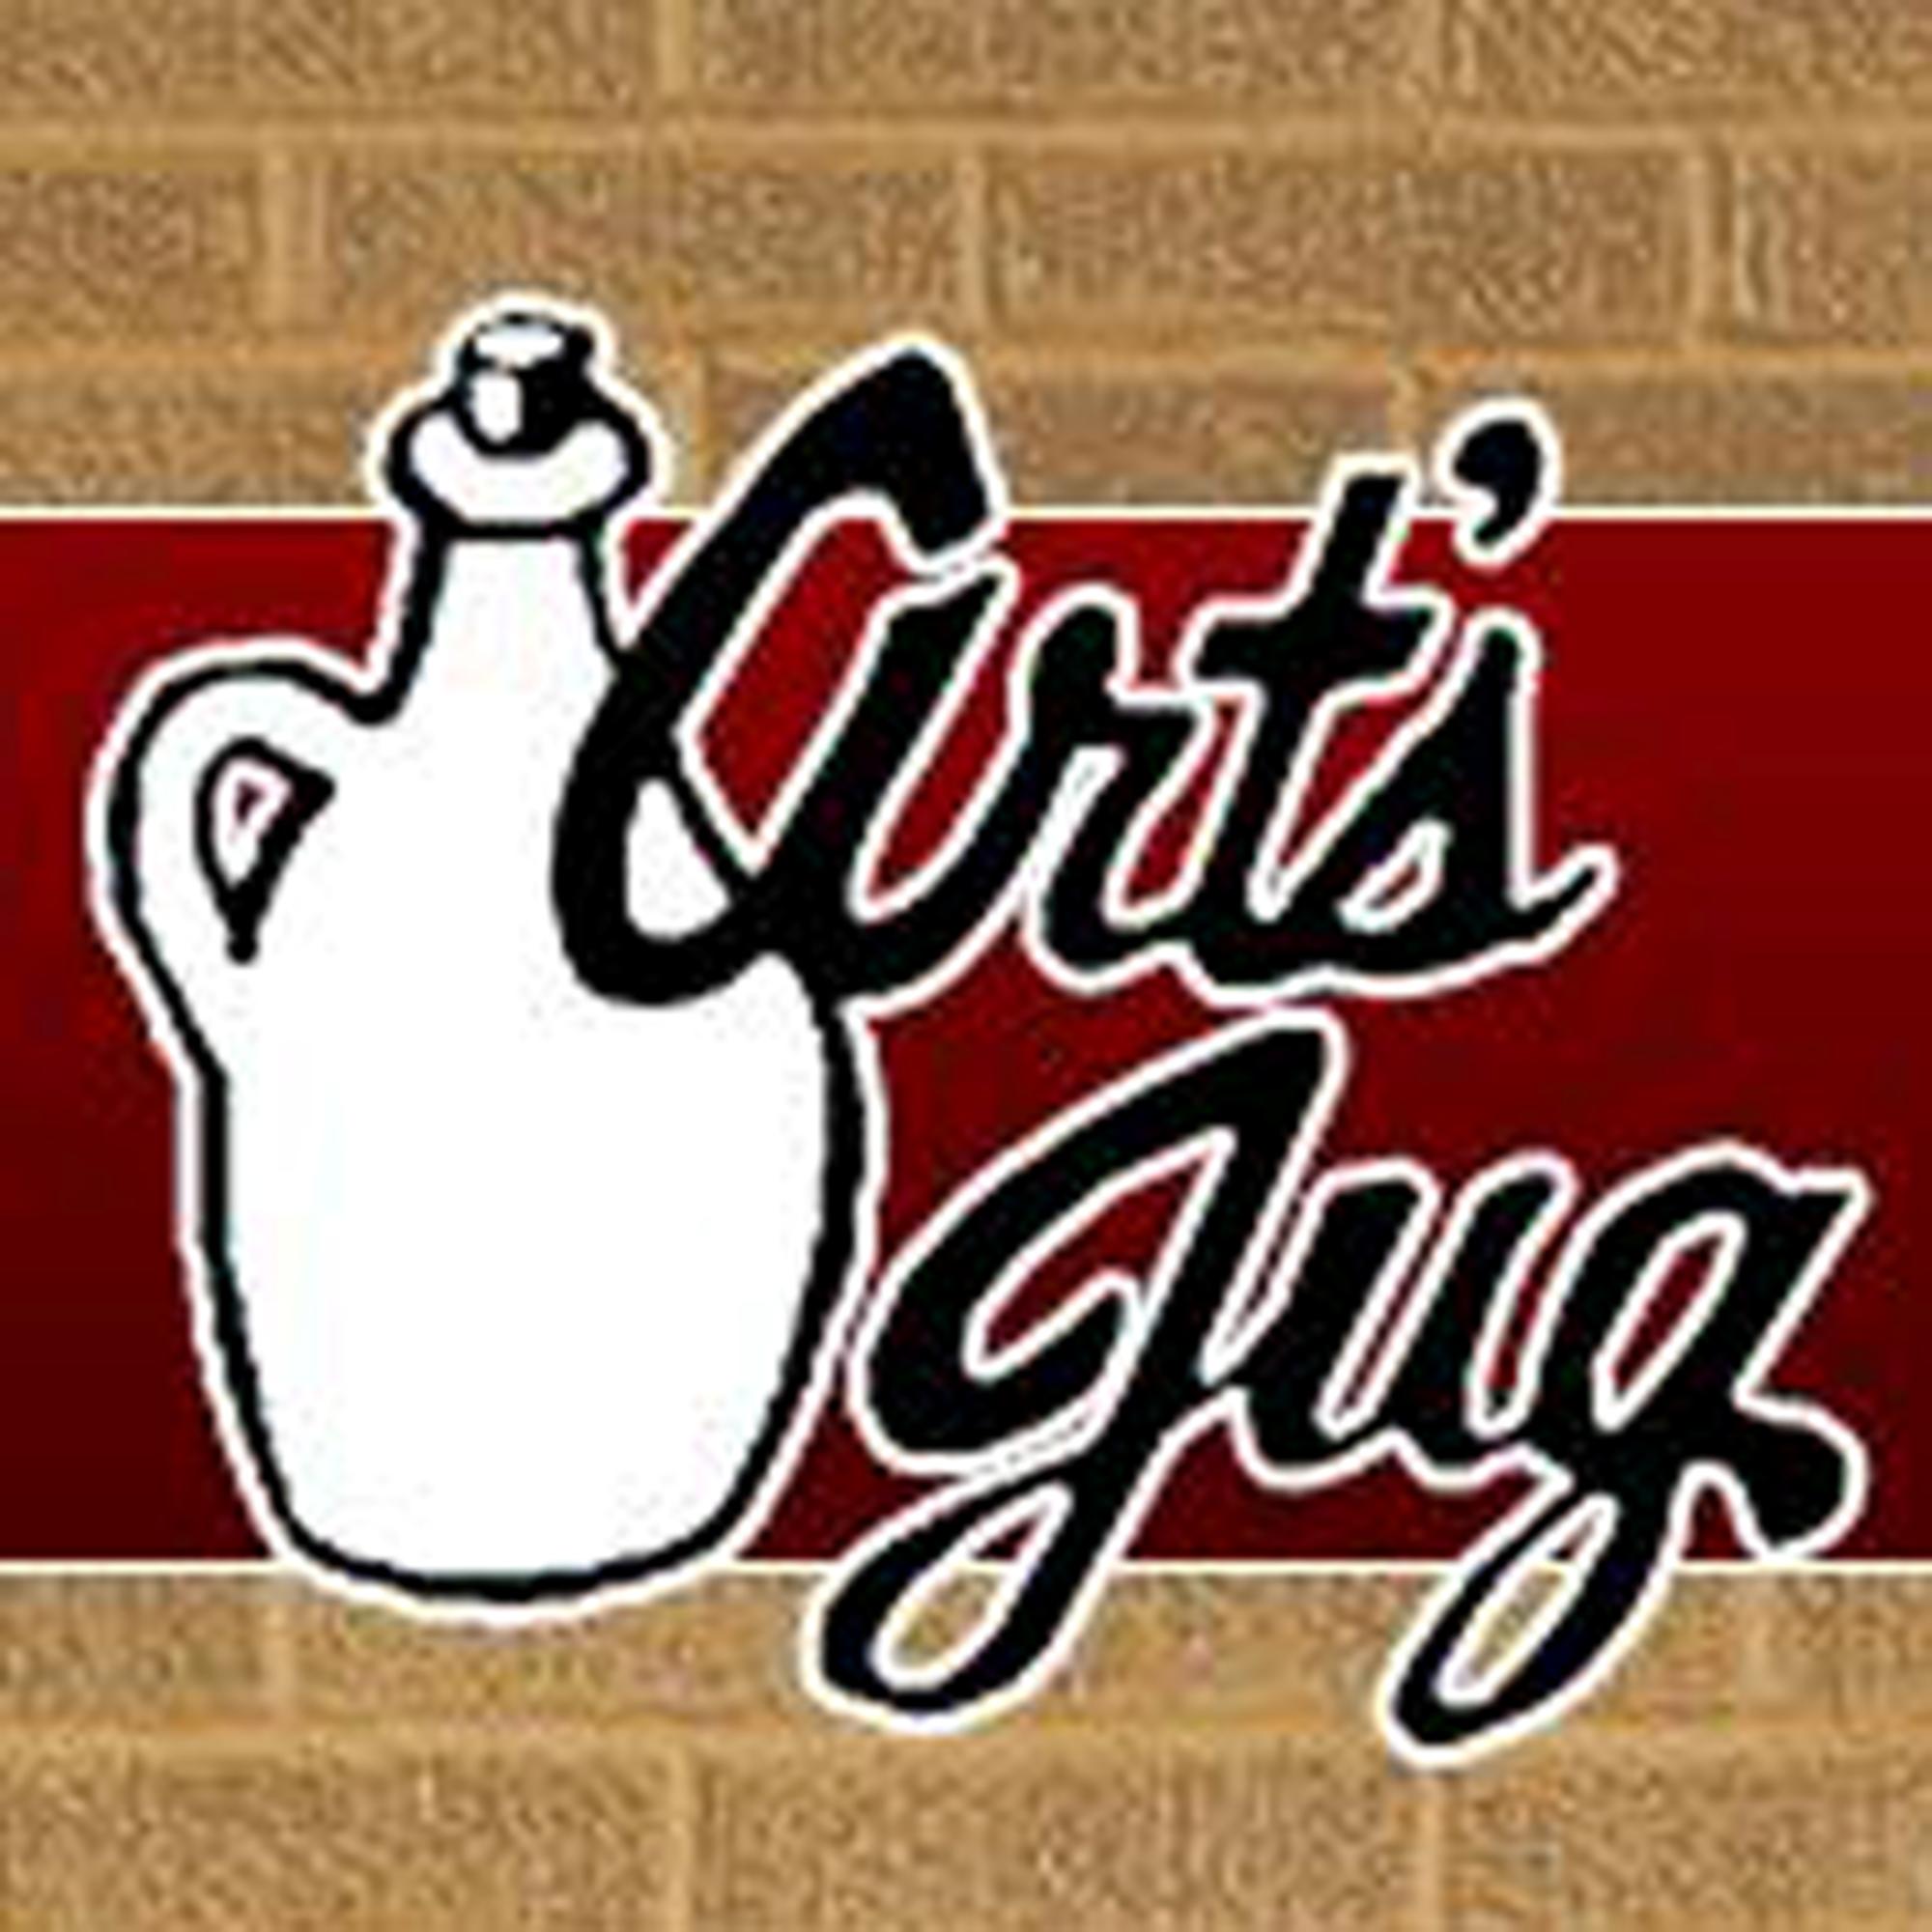 Art's Jug Restaurant, Watertown NY